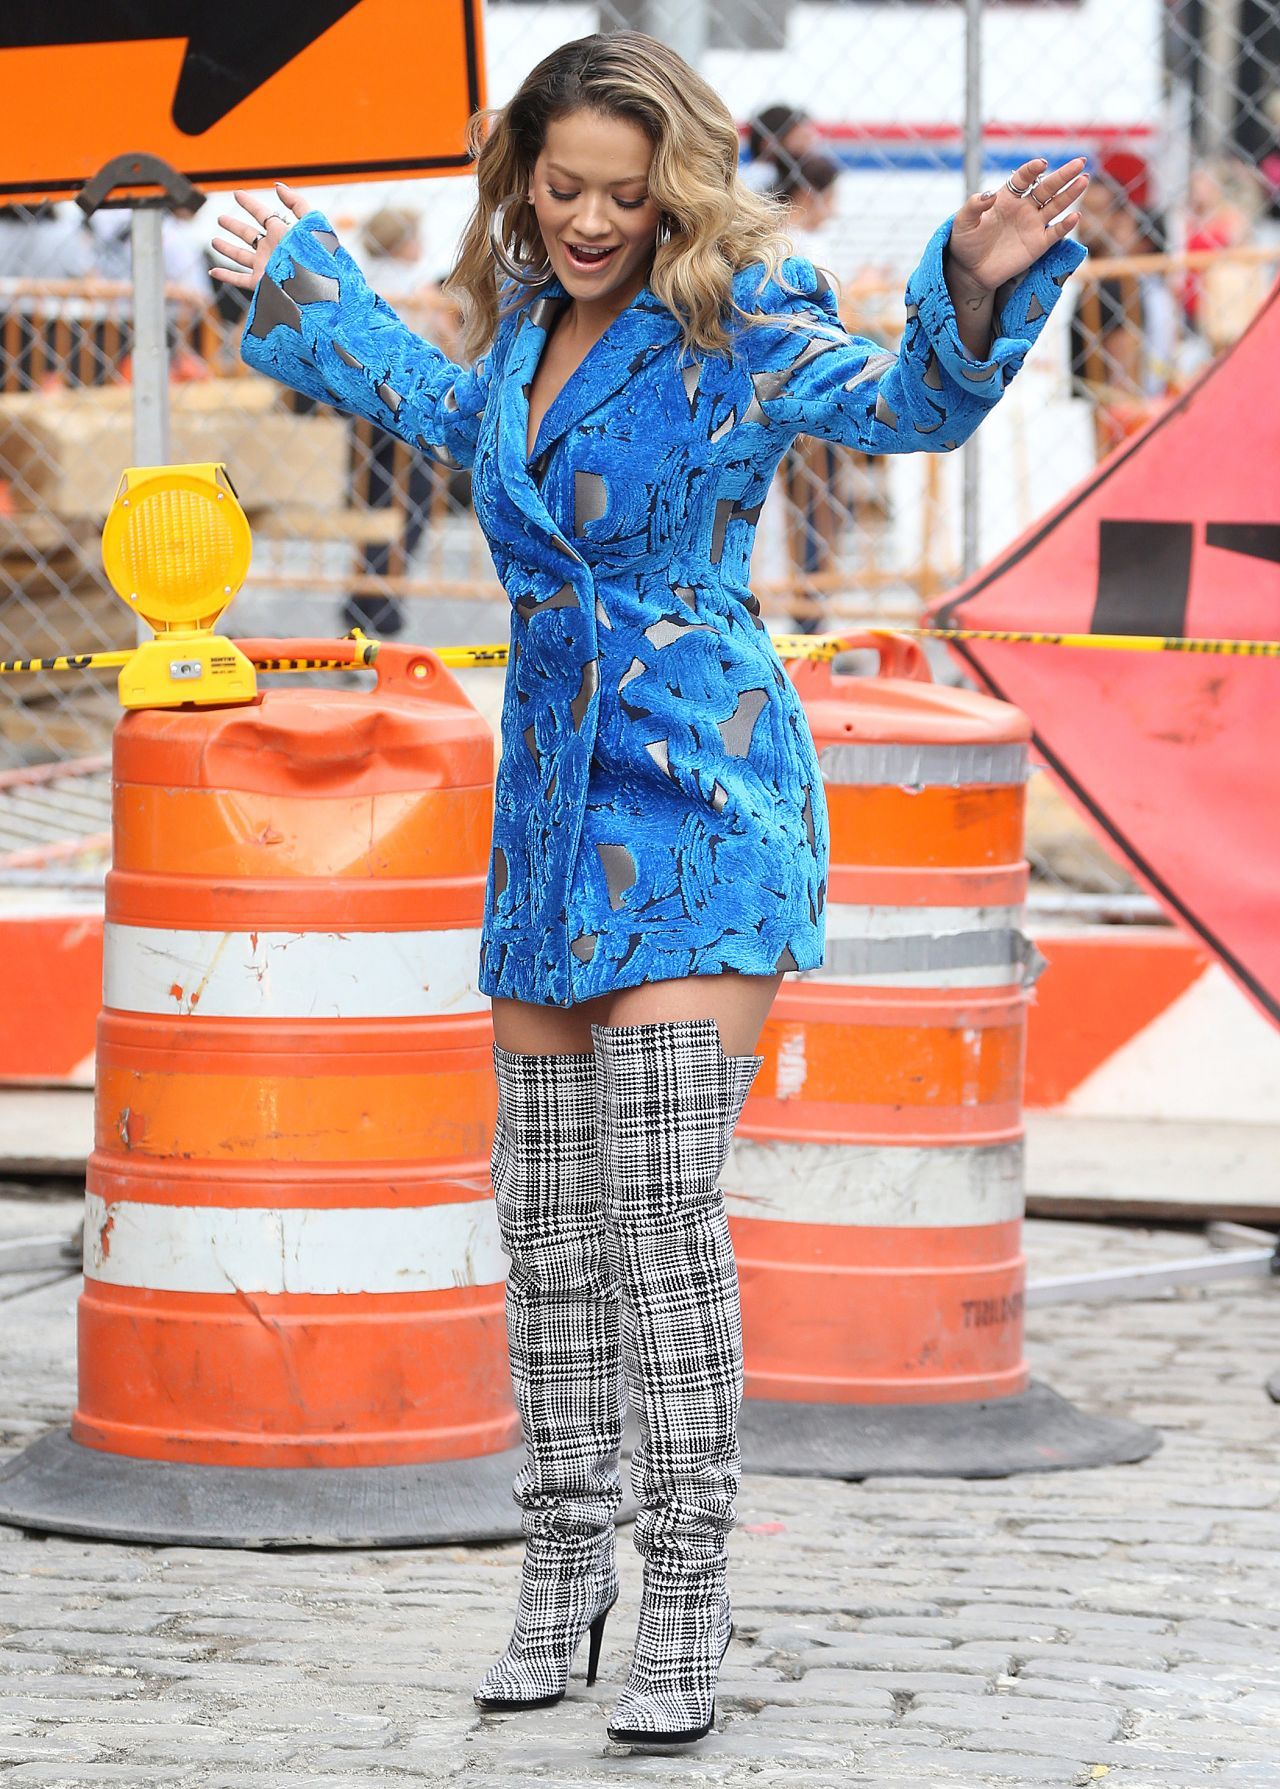 rita-ora-filming-a-music-video-in-new-york-city-10-05-2017-7.jpg